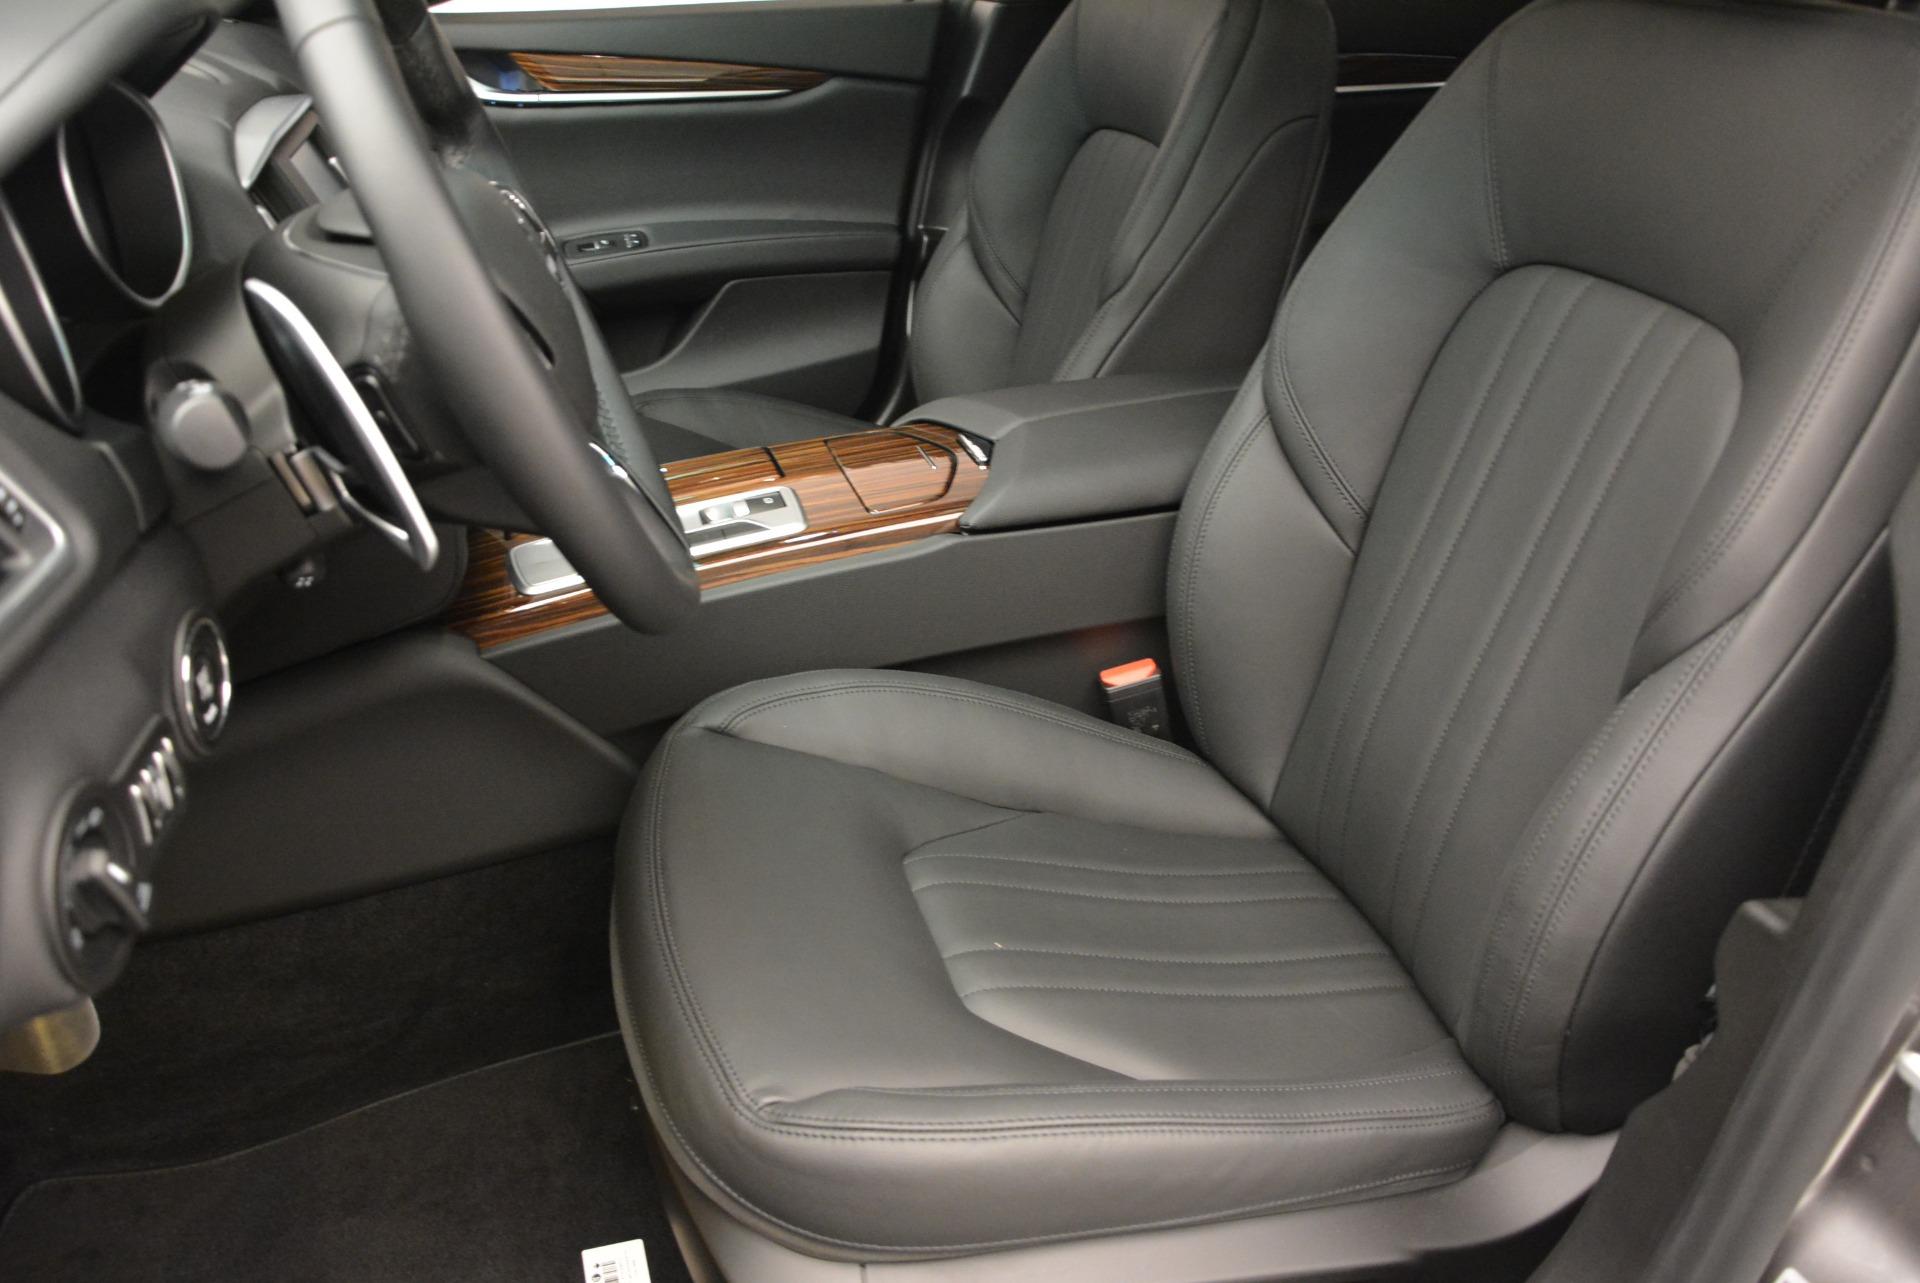 Used 2014 Maserati Ghibli S Q4 For Sale In Westport, CT 2562_p16